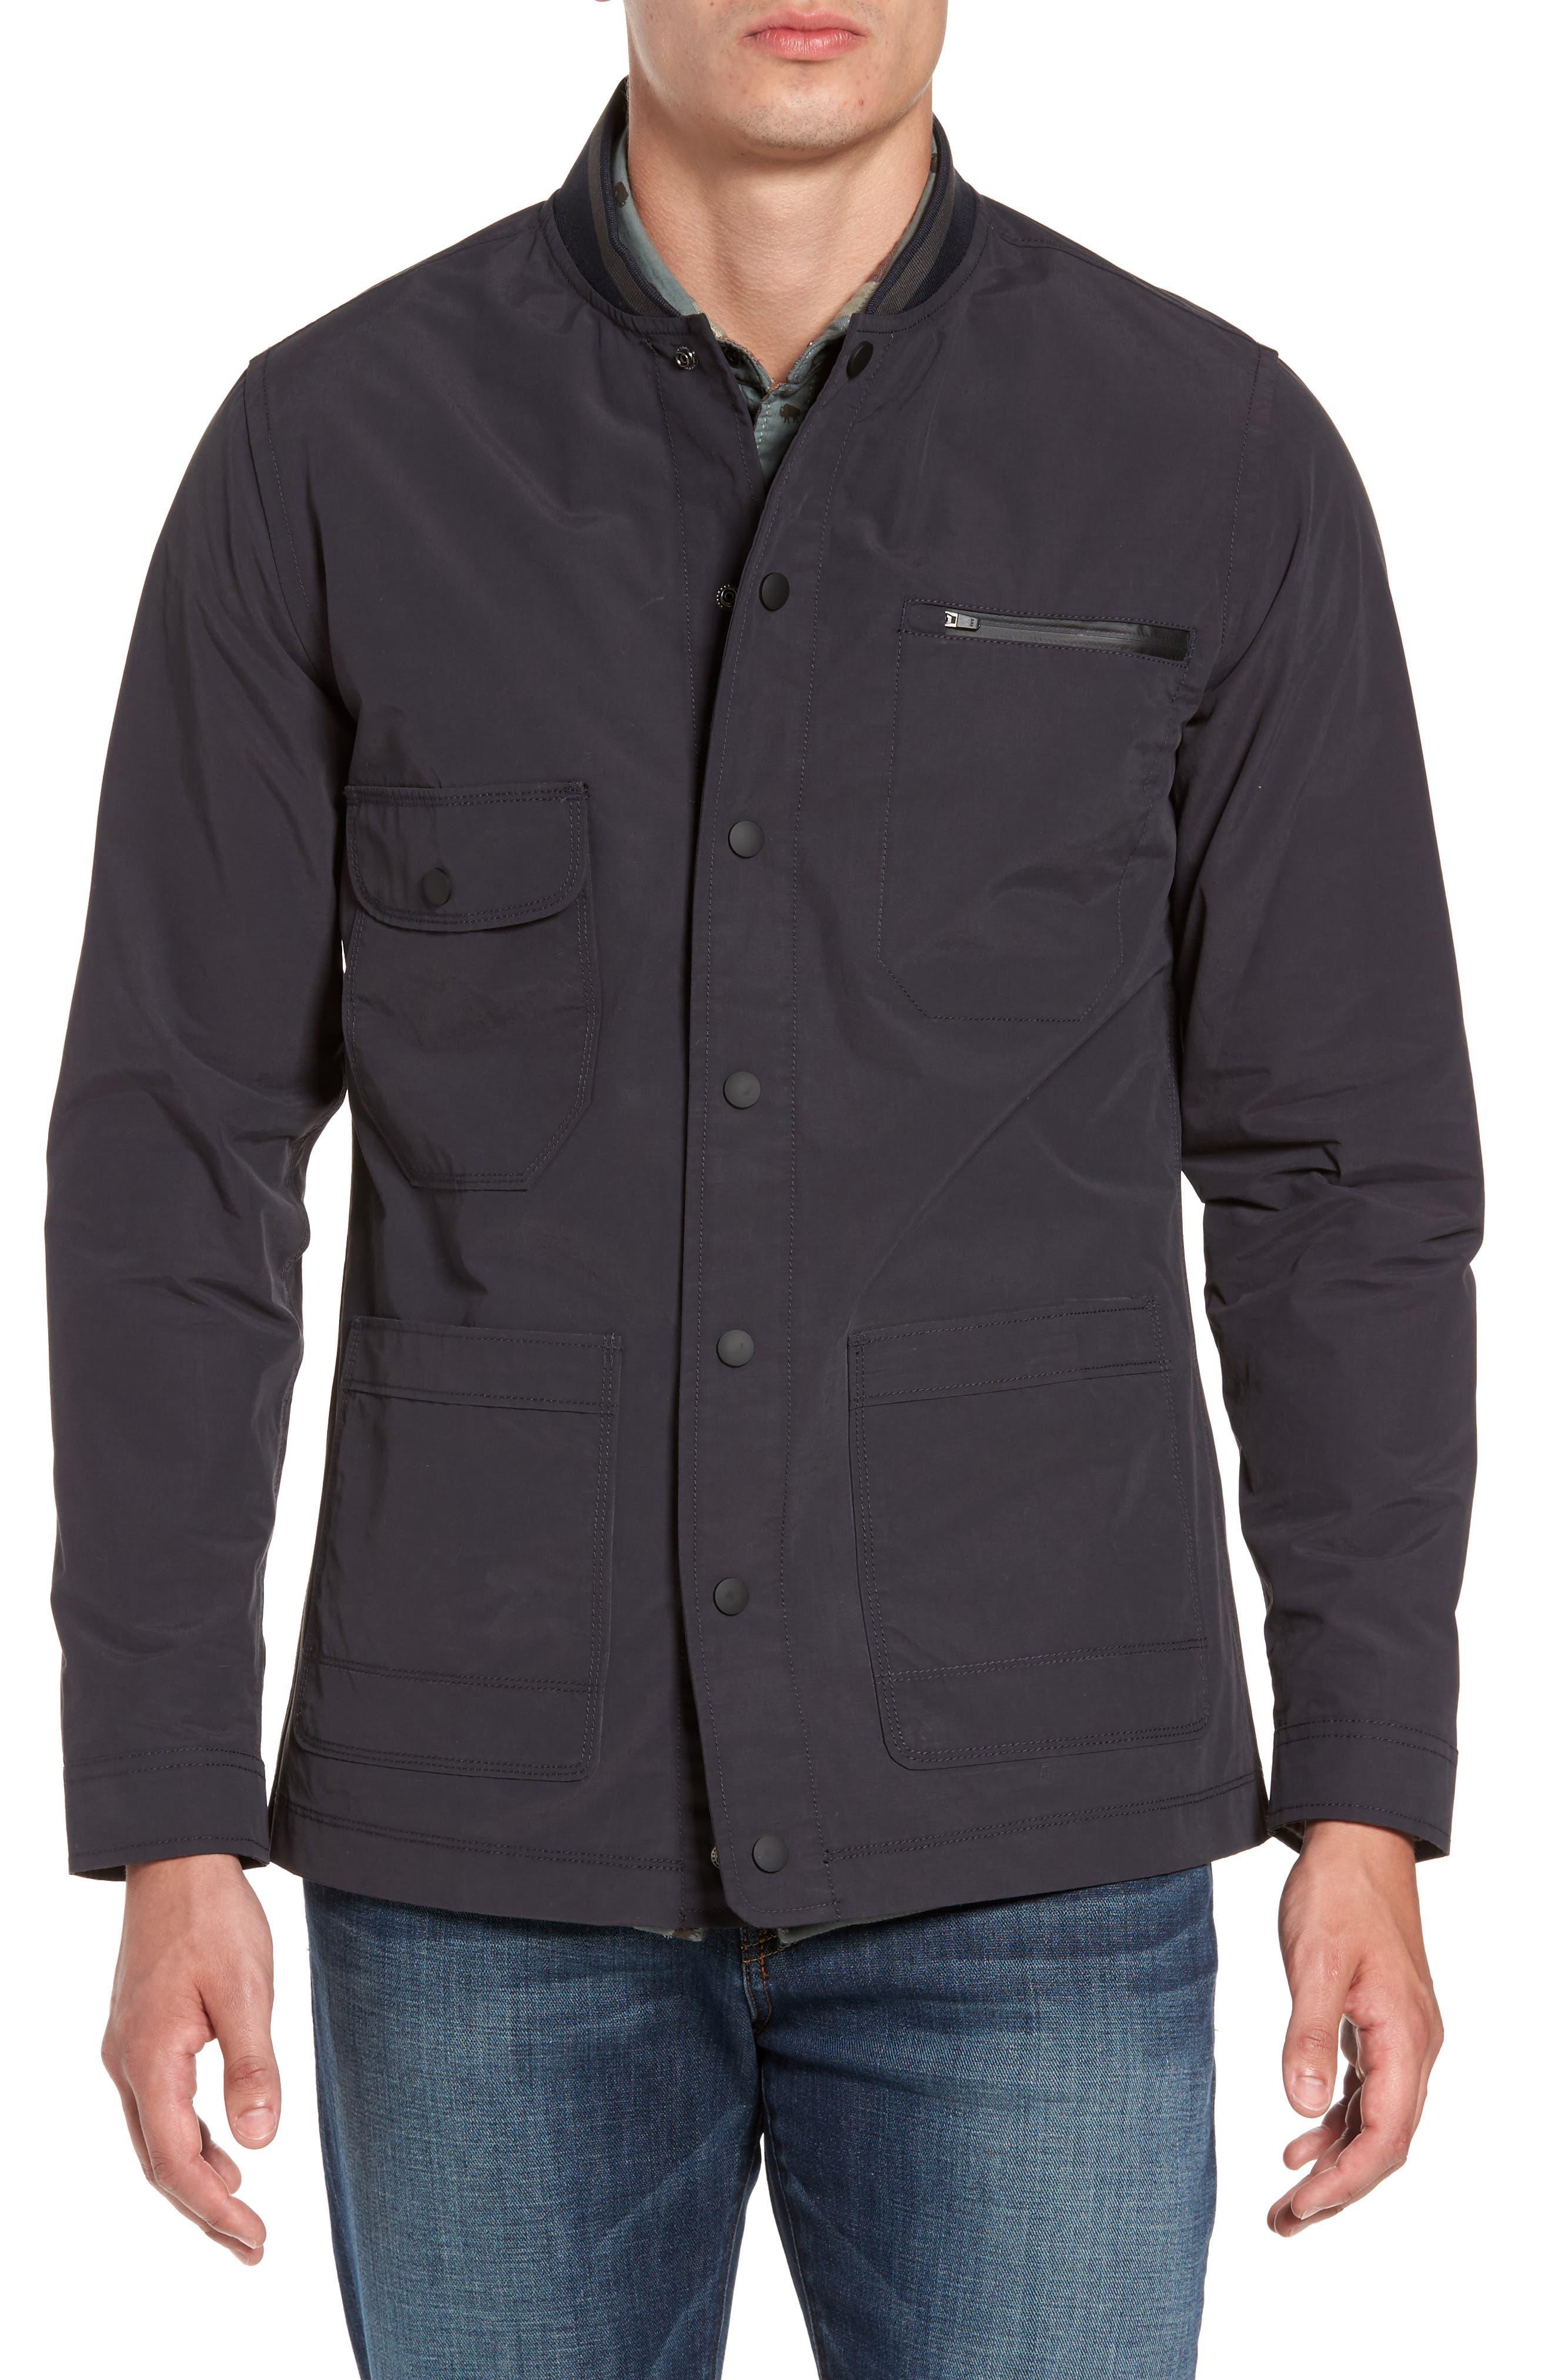 Alternate Image 3  - Jeremiah Jarvis Coated Cotton Blend Jacket